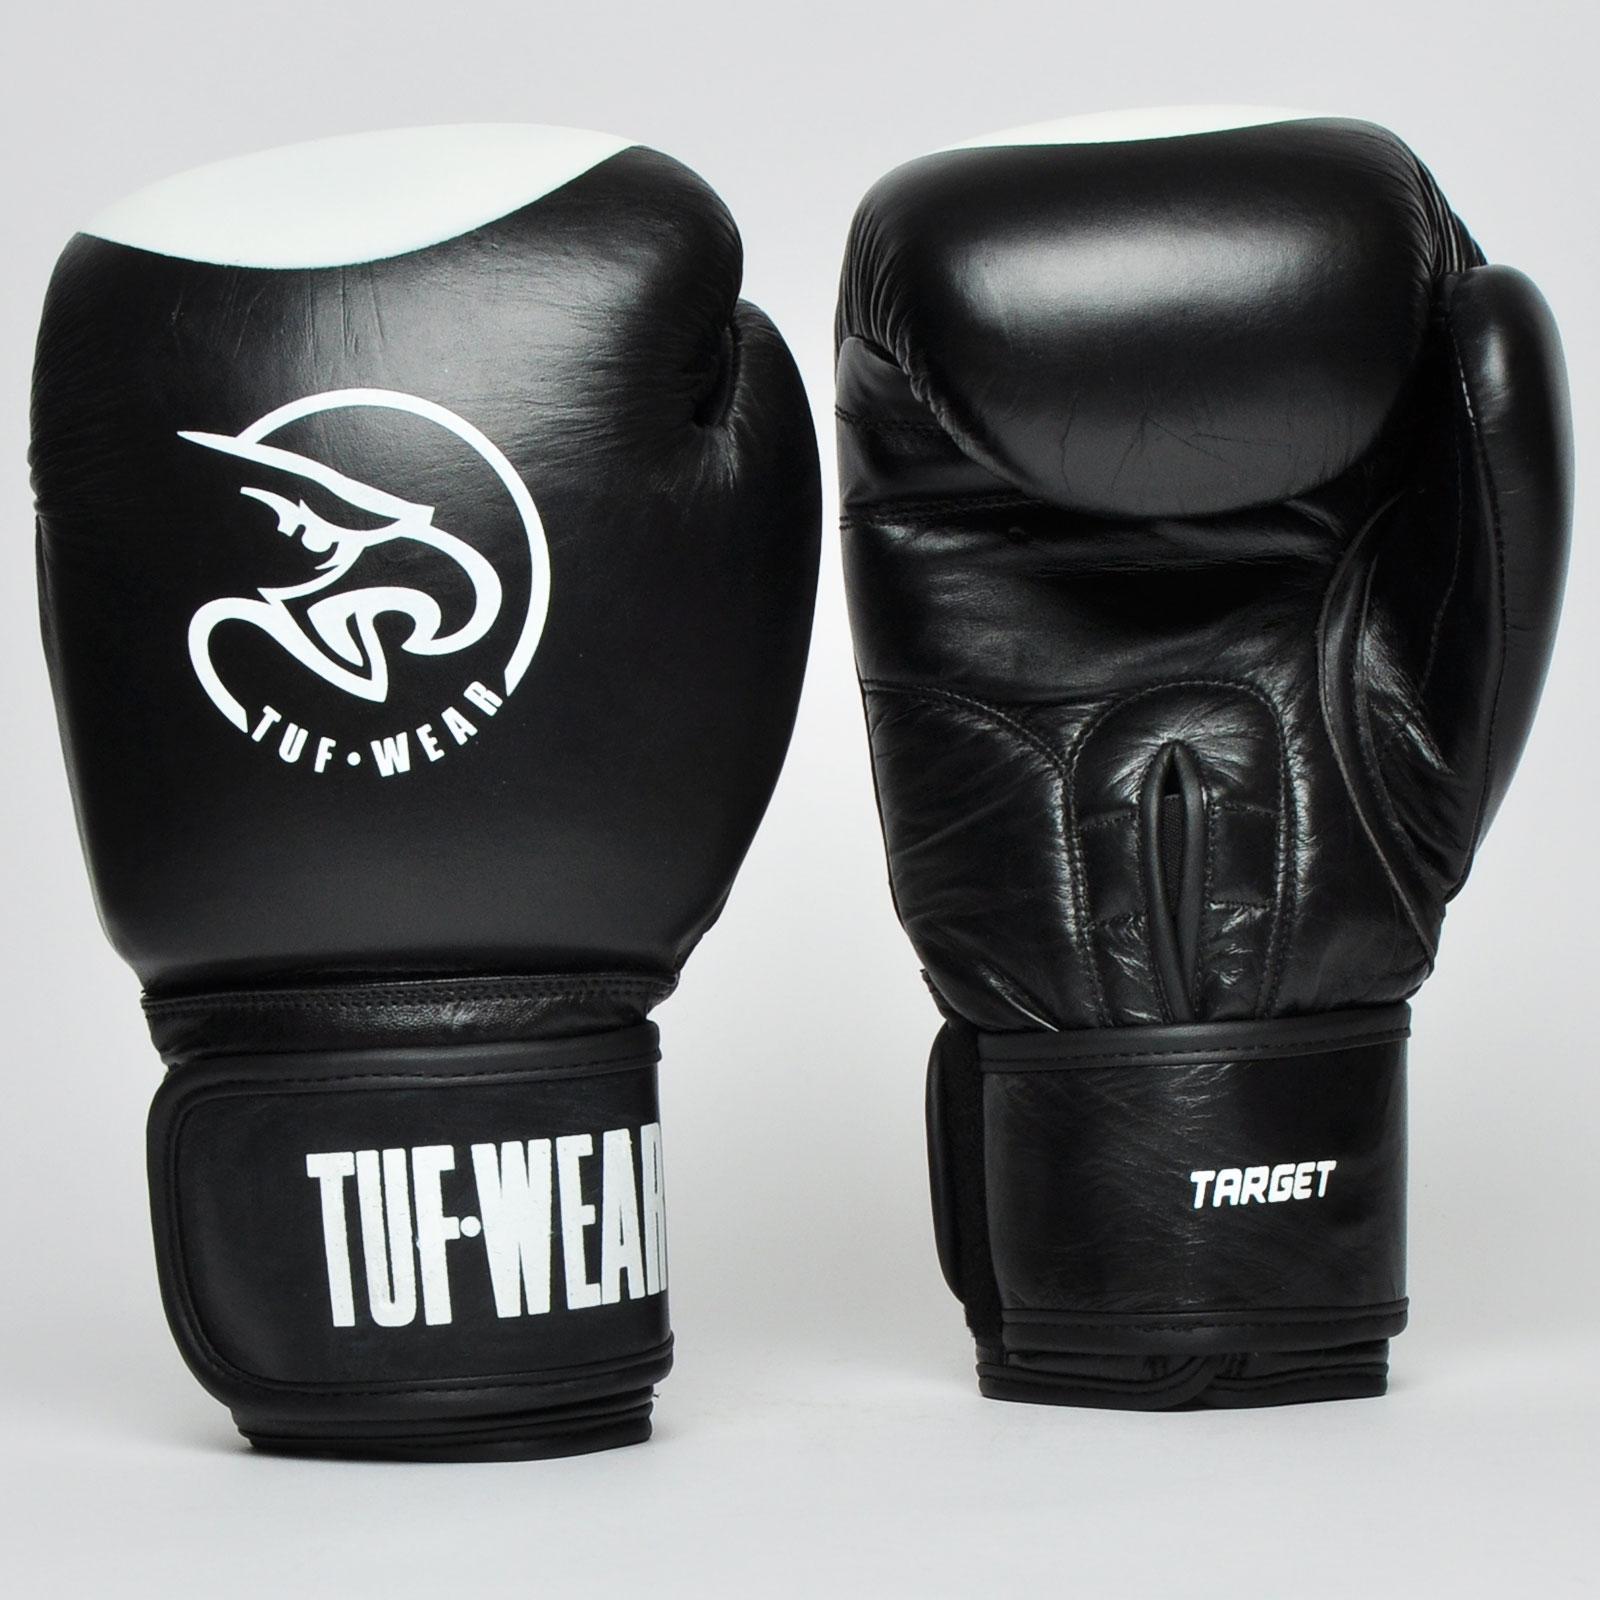 Tuf Wear Boxing Paddles Training Pads